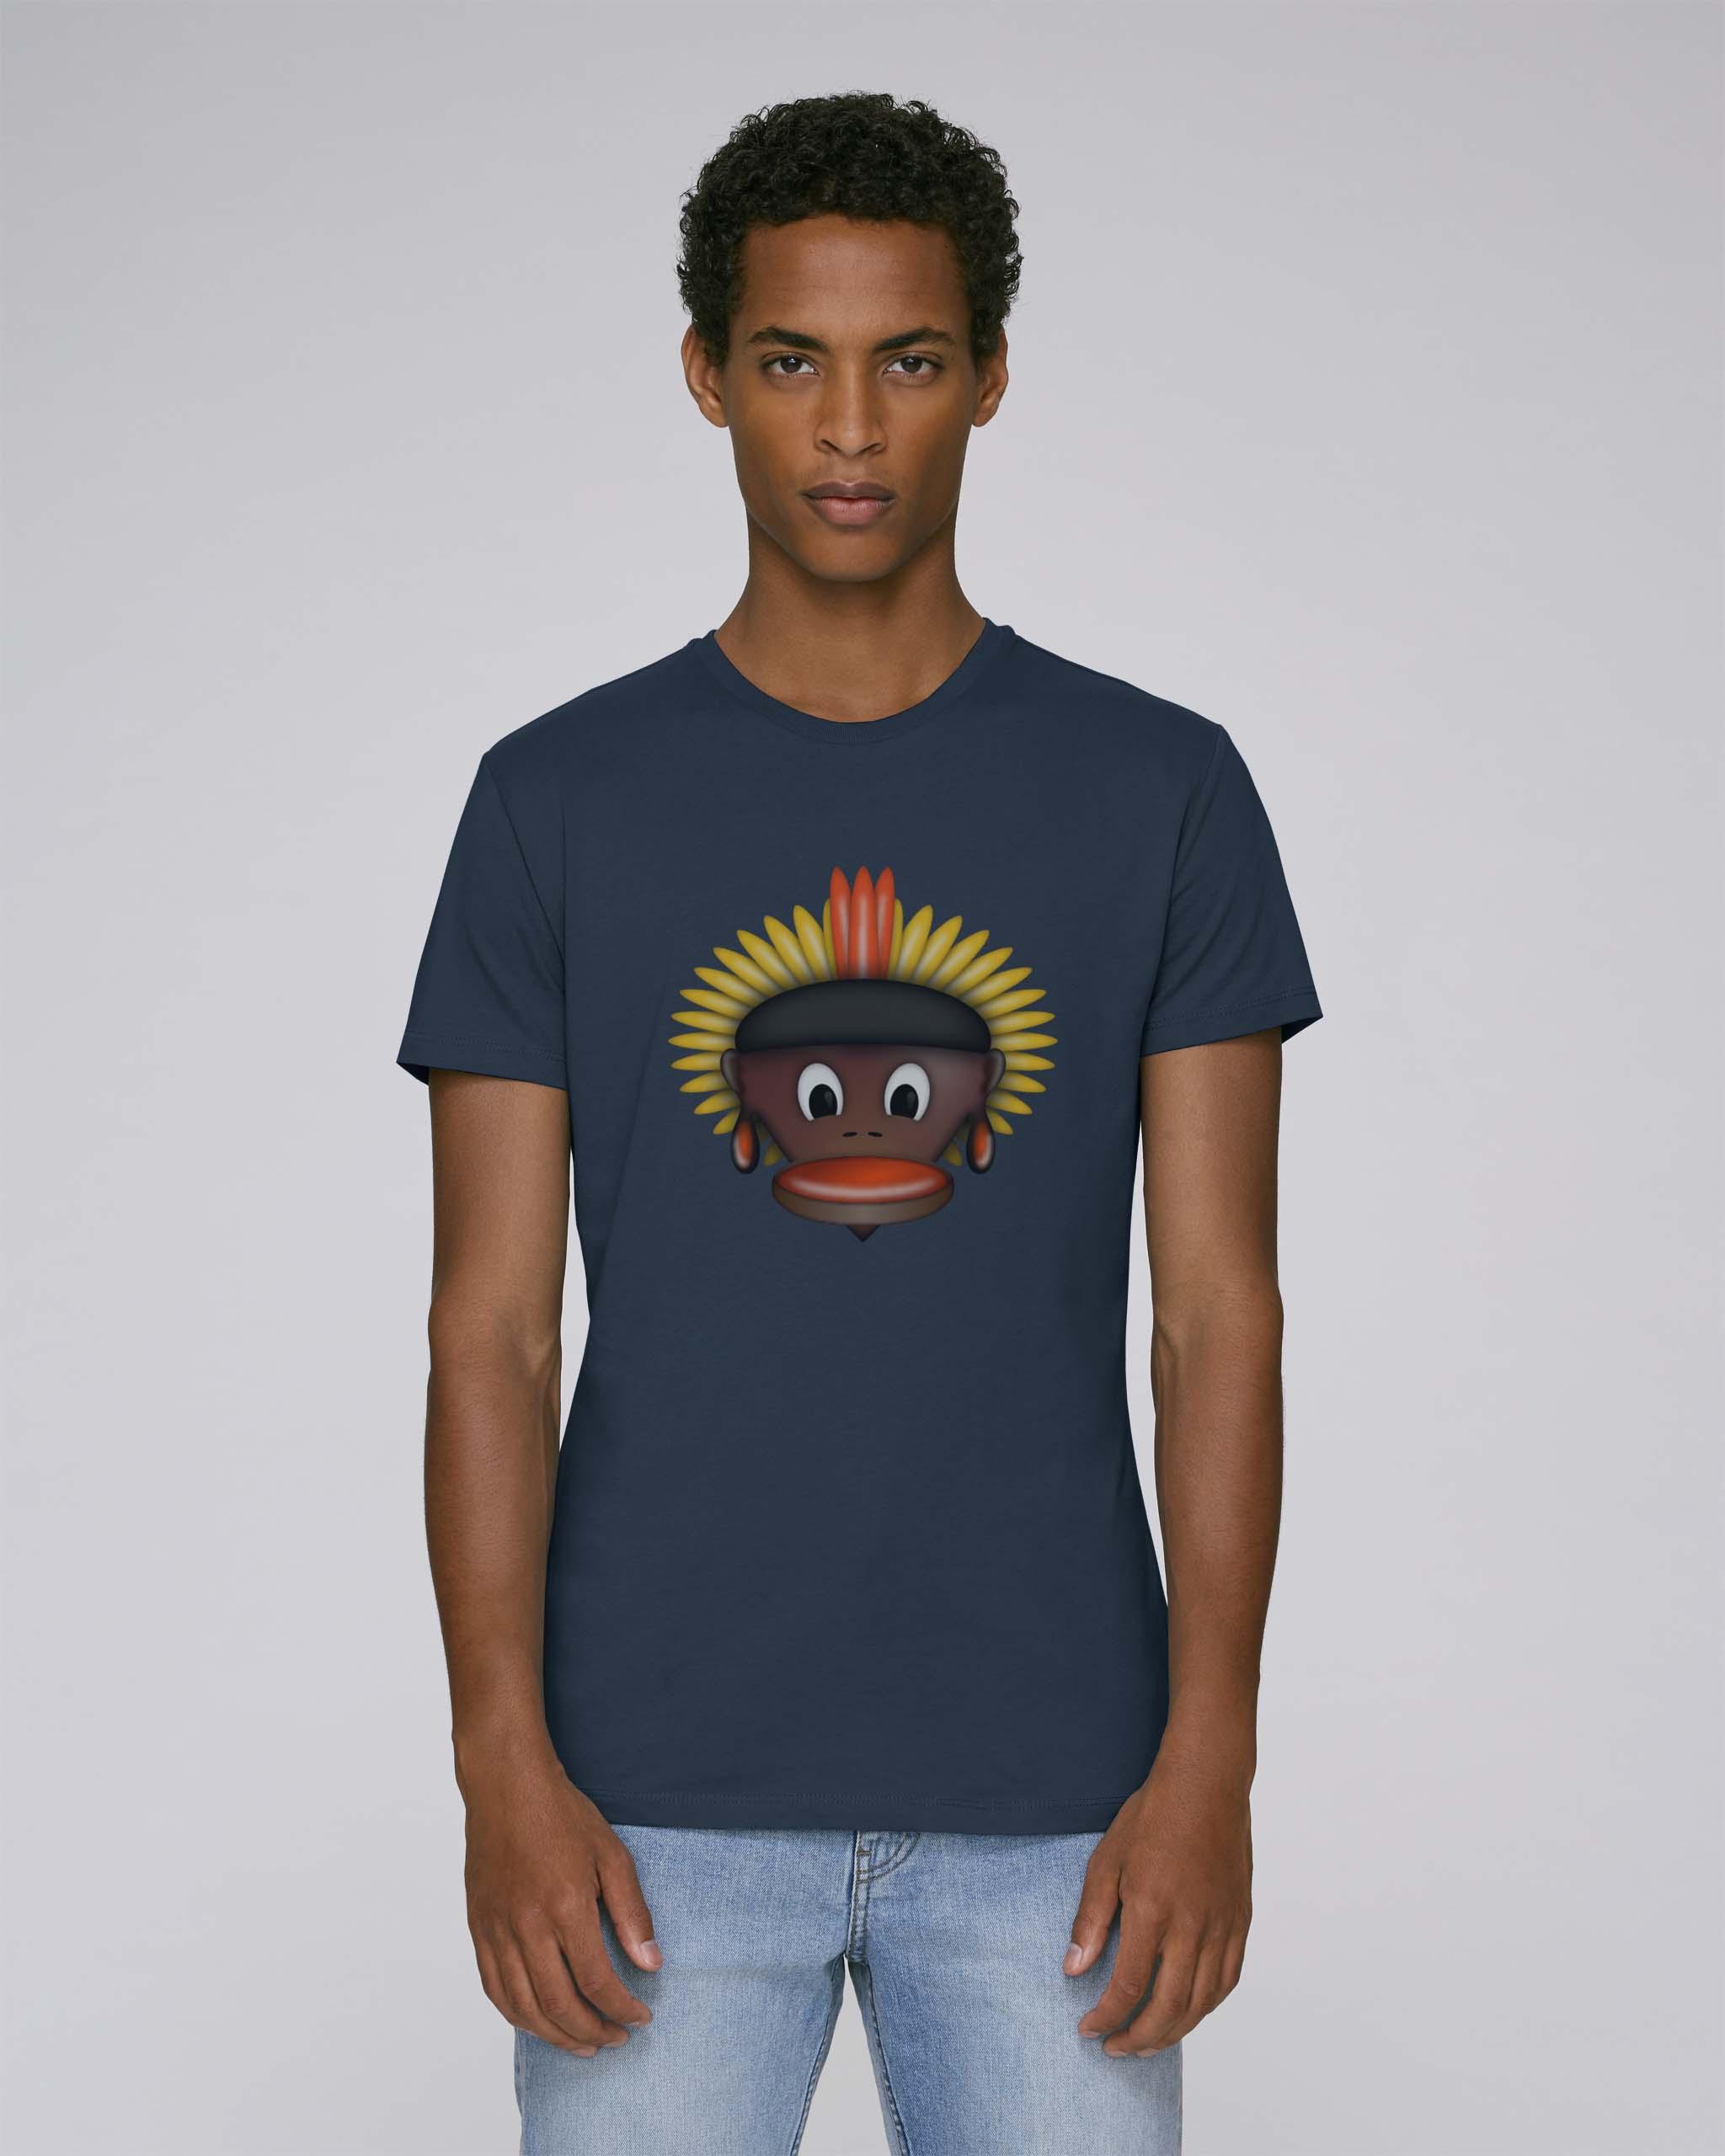 T-Shirt bleu/gris Bio Homme - Tribe tee